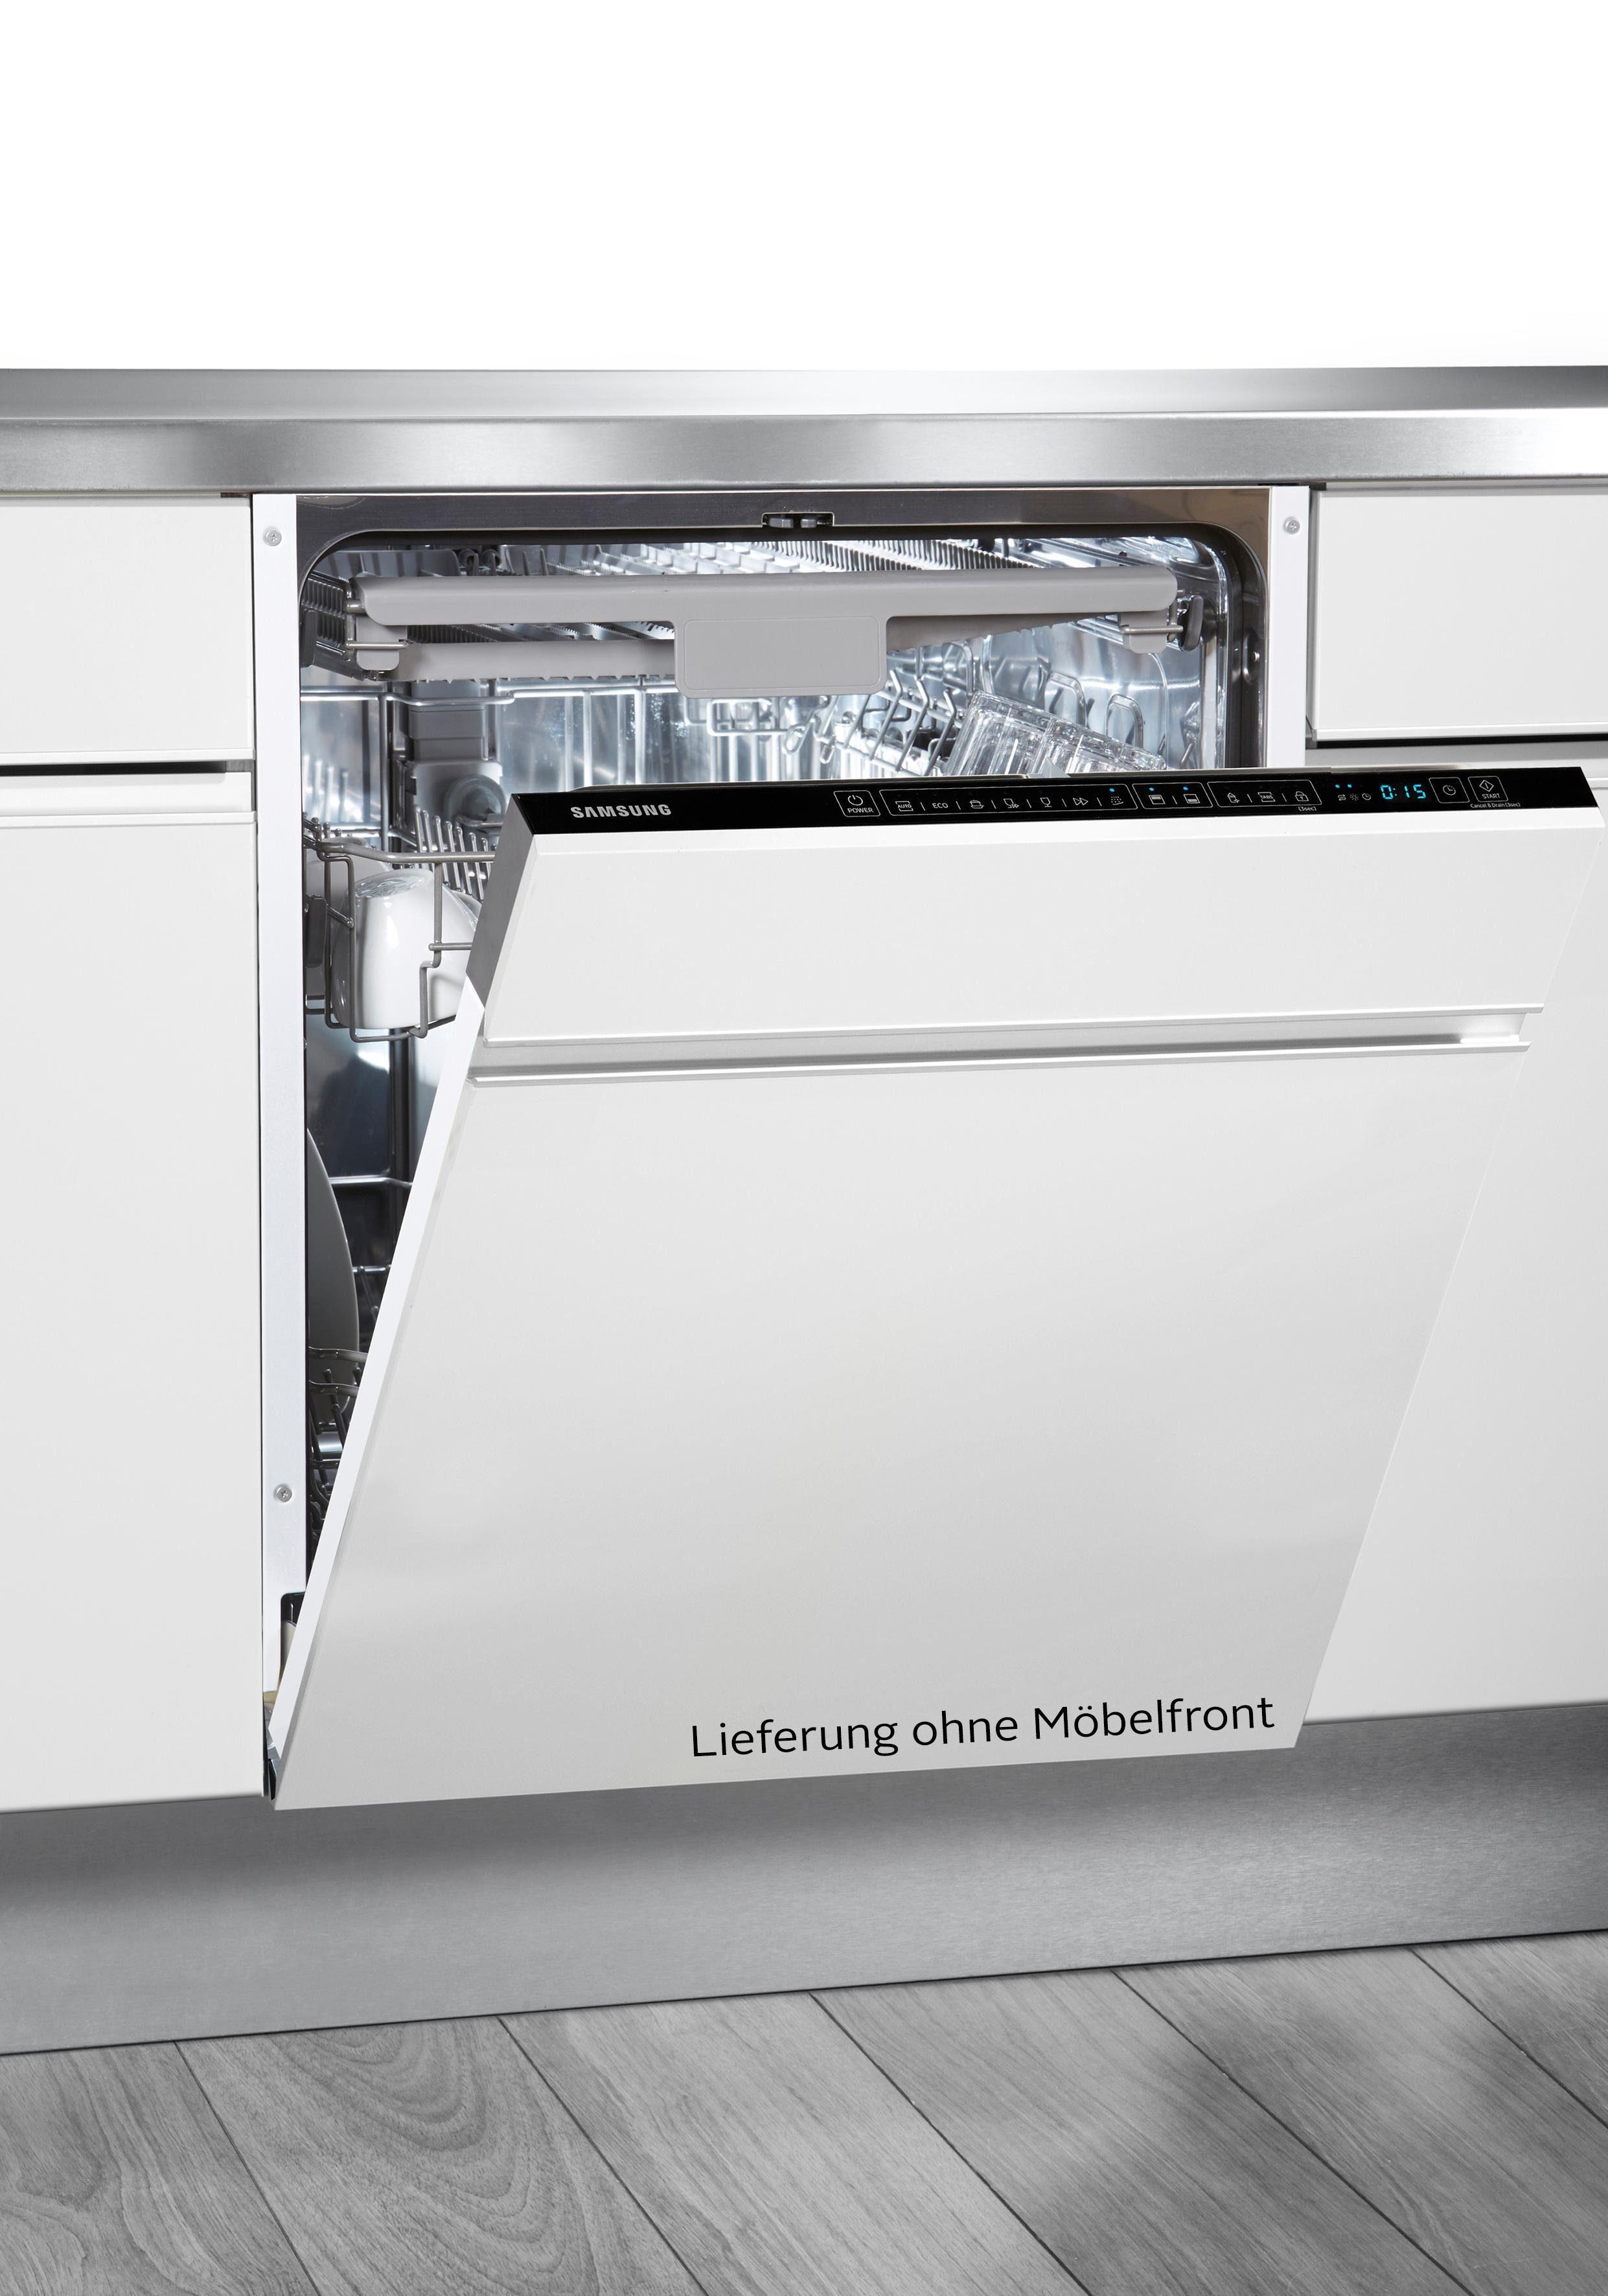 Samsung vollintegrierbarer Geschirrspüler, DW60M6050BB/EG, 10,5 l, 14 Maßgedecke